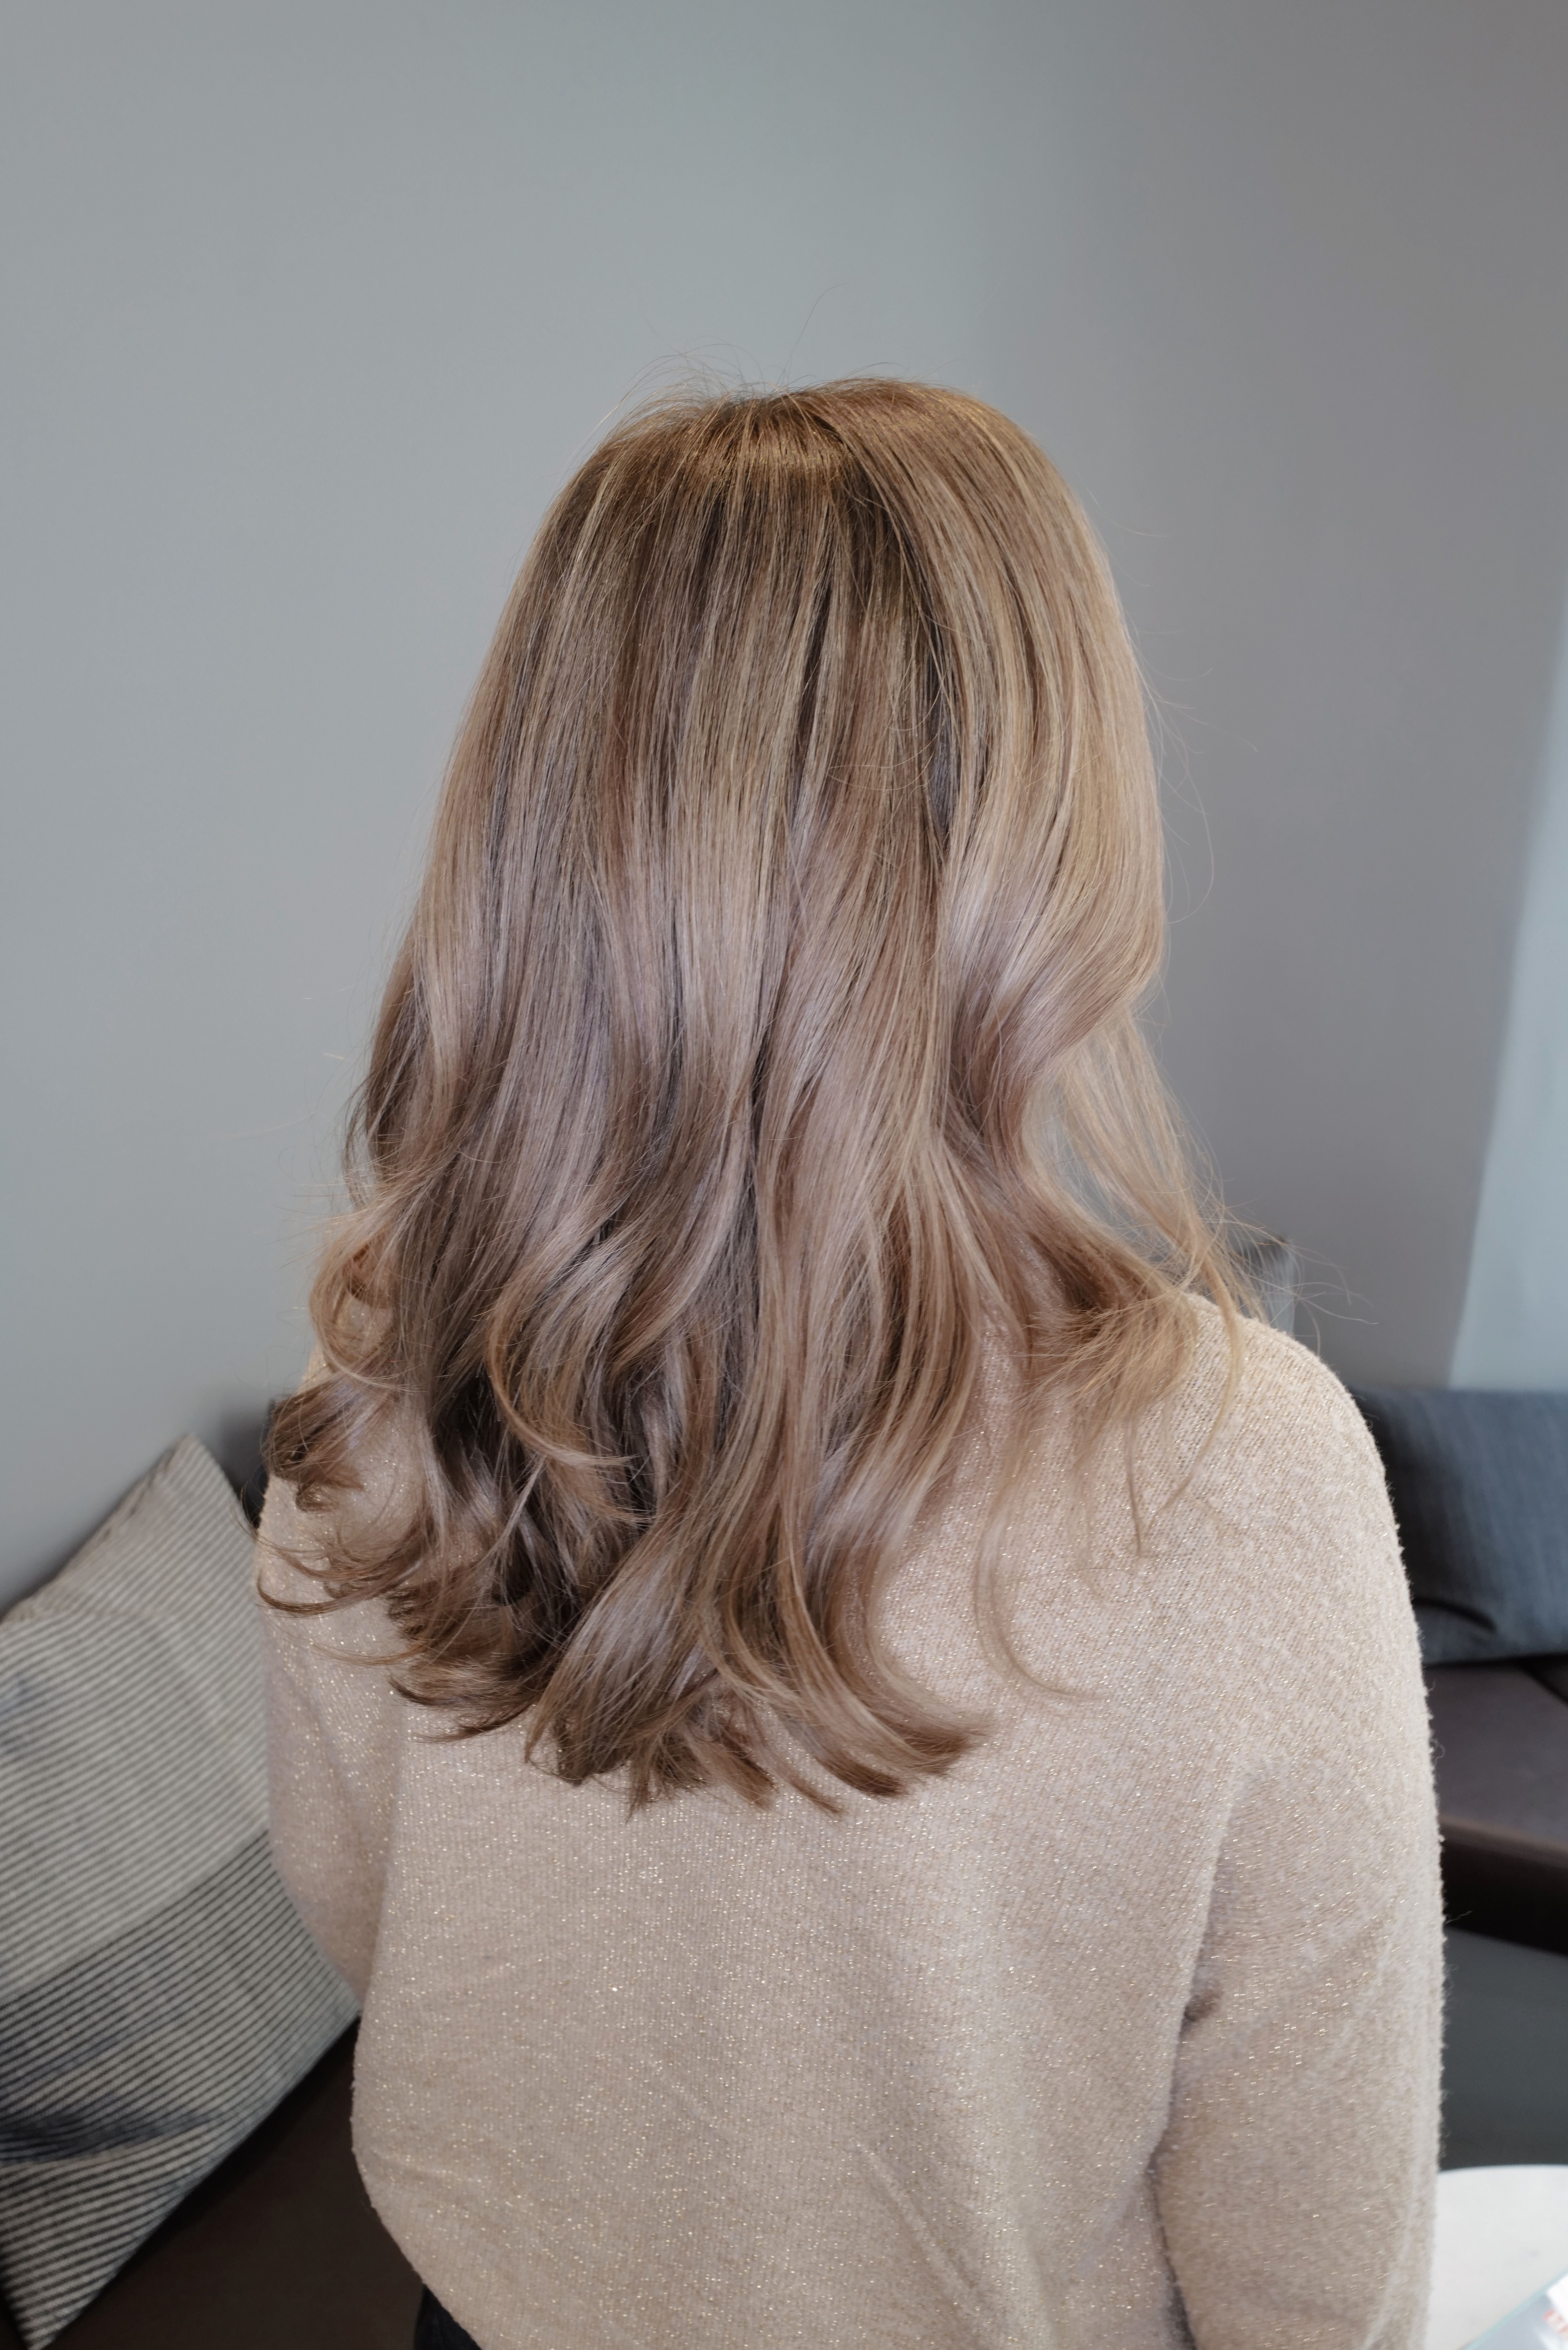 #hairgoals #haircolorist #hairideas #hairinspo #hairtrends #hairoftheday #citiesbesthairartists #yeswecollab #balayage   #livedincolor #hairstyleoftheday #balayagesociety #behindthechair #modernsalon #showmethebalayage  #frisörstockholm #hårfärg #hårinspo #frisörsverige #hairpainters #frisör #frisörsthlm #mastersofbalayage